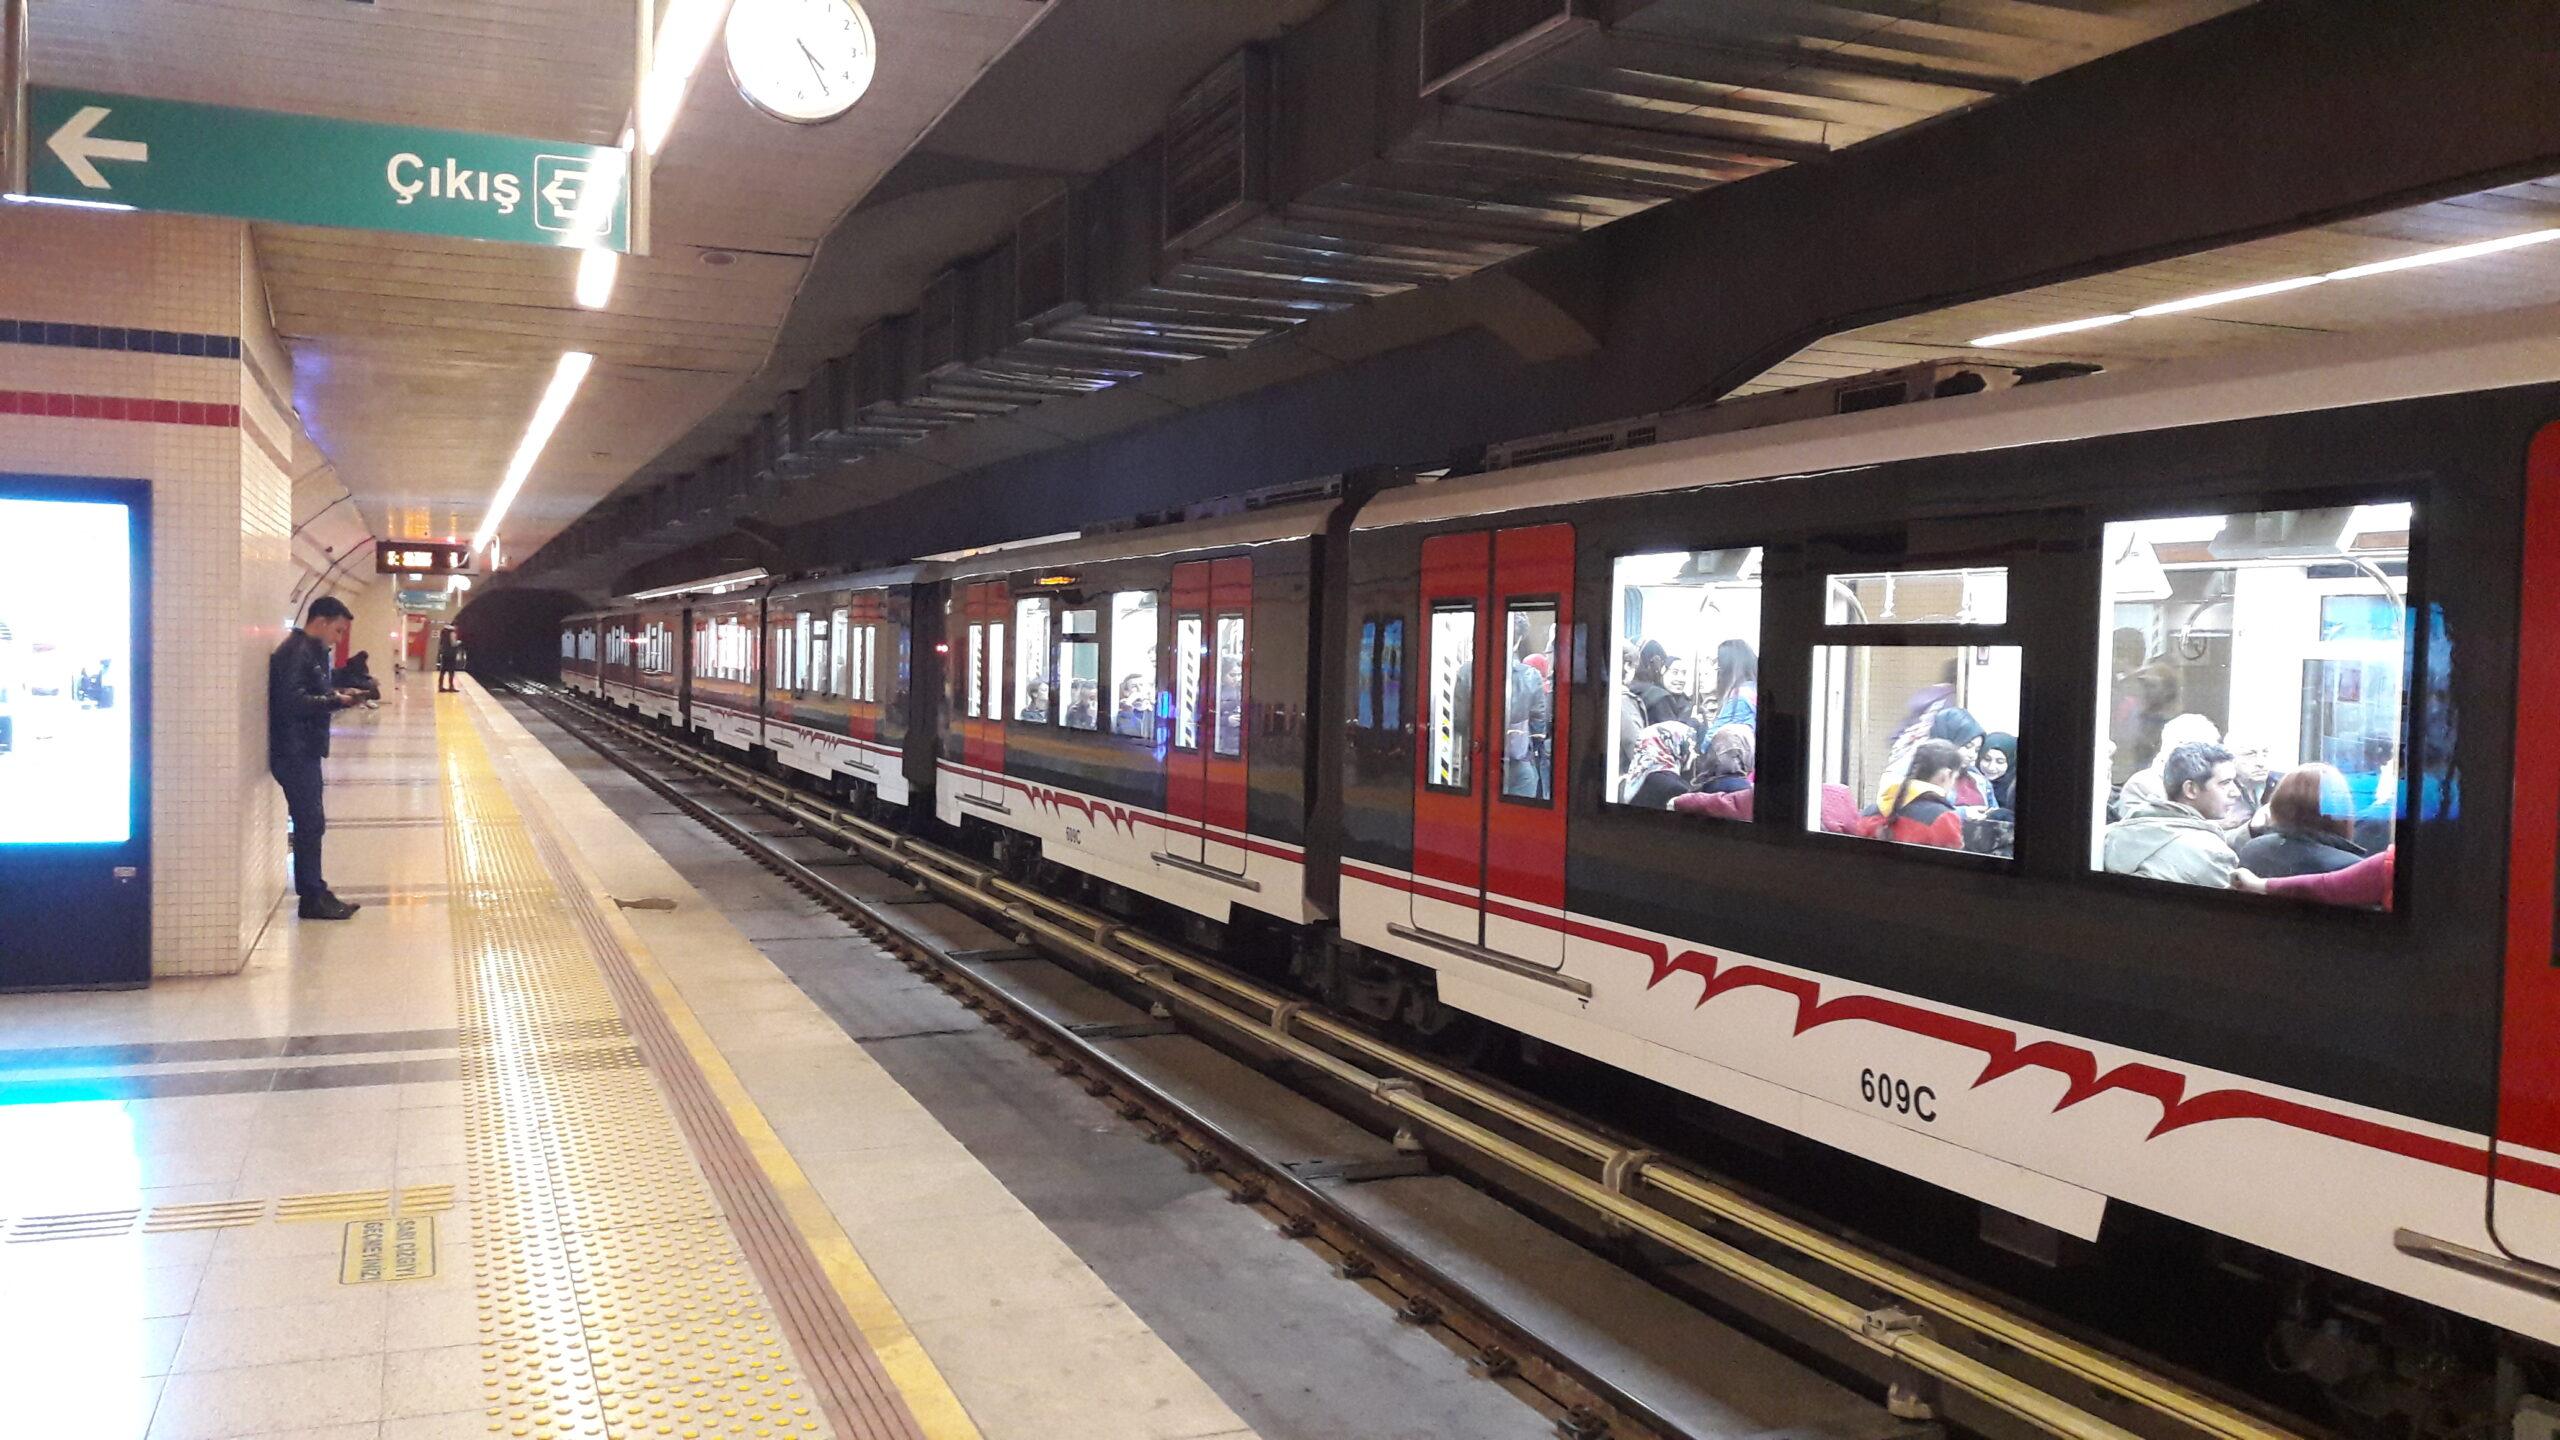 Poligon metro station in Izmir